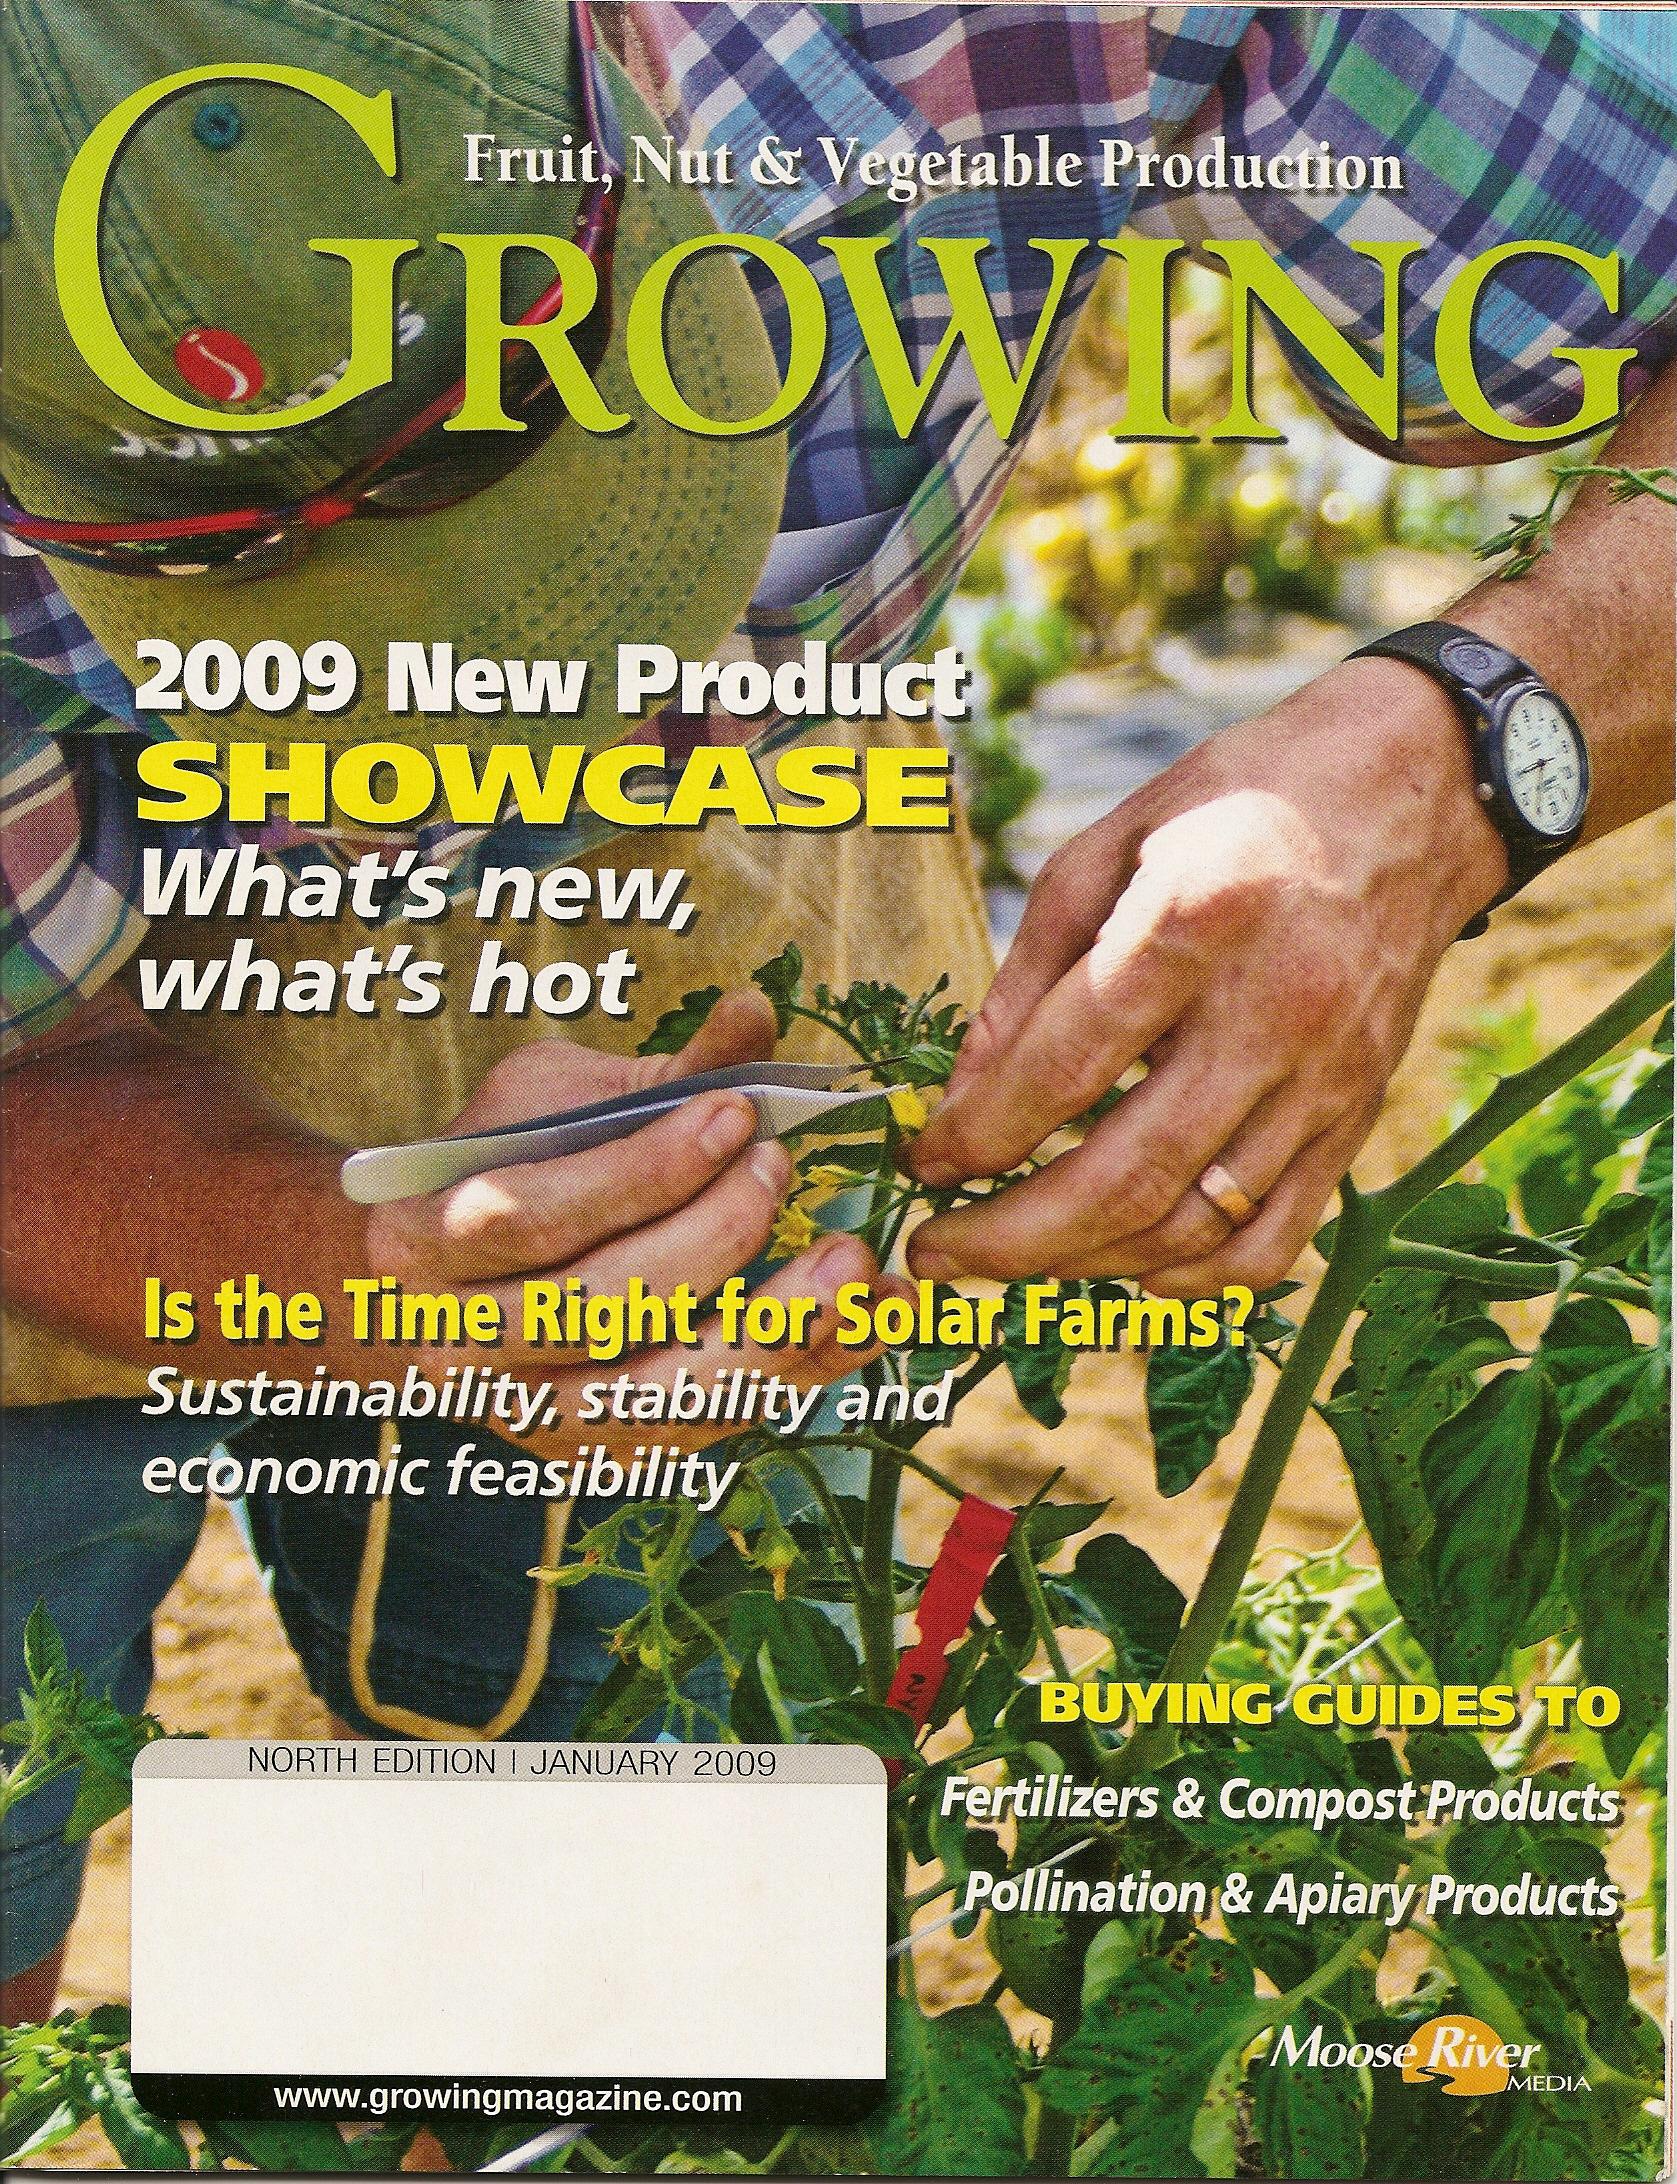 Growing 1-2009